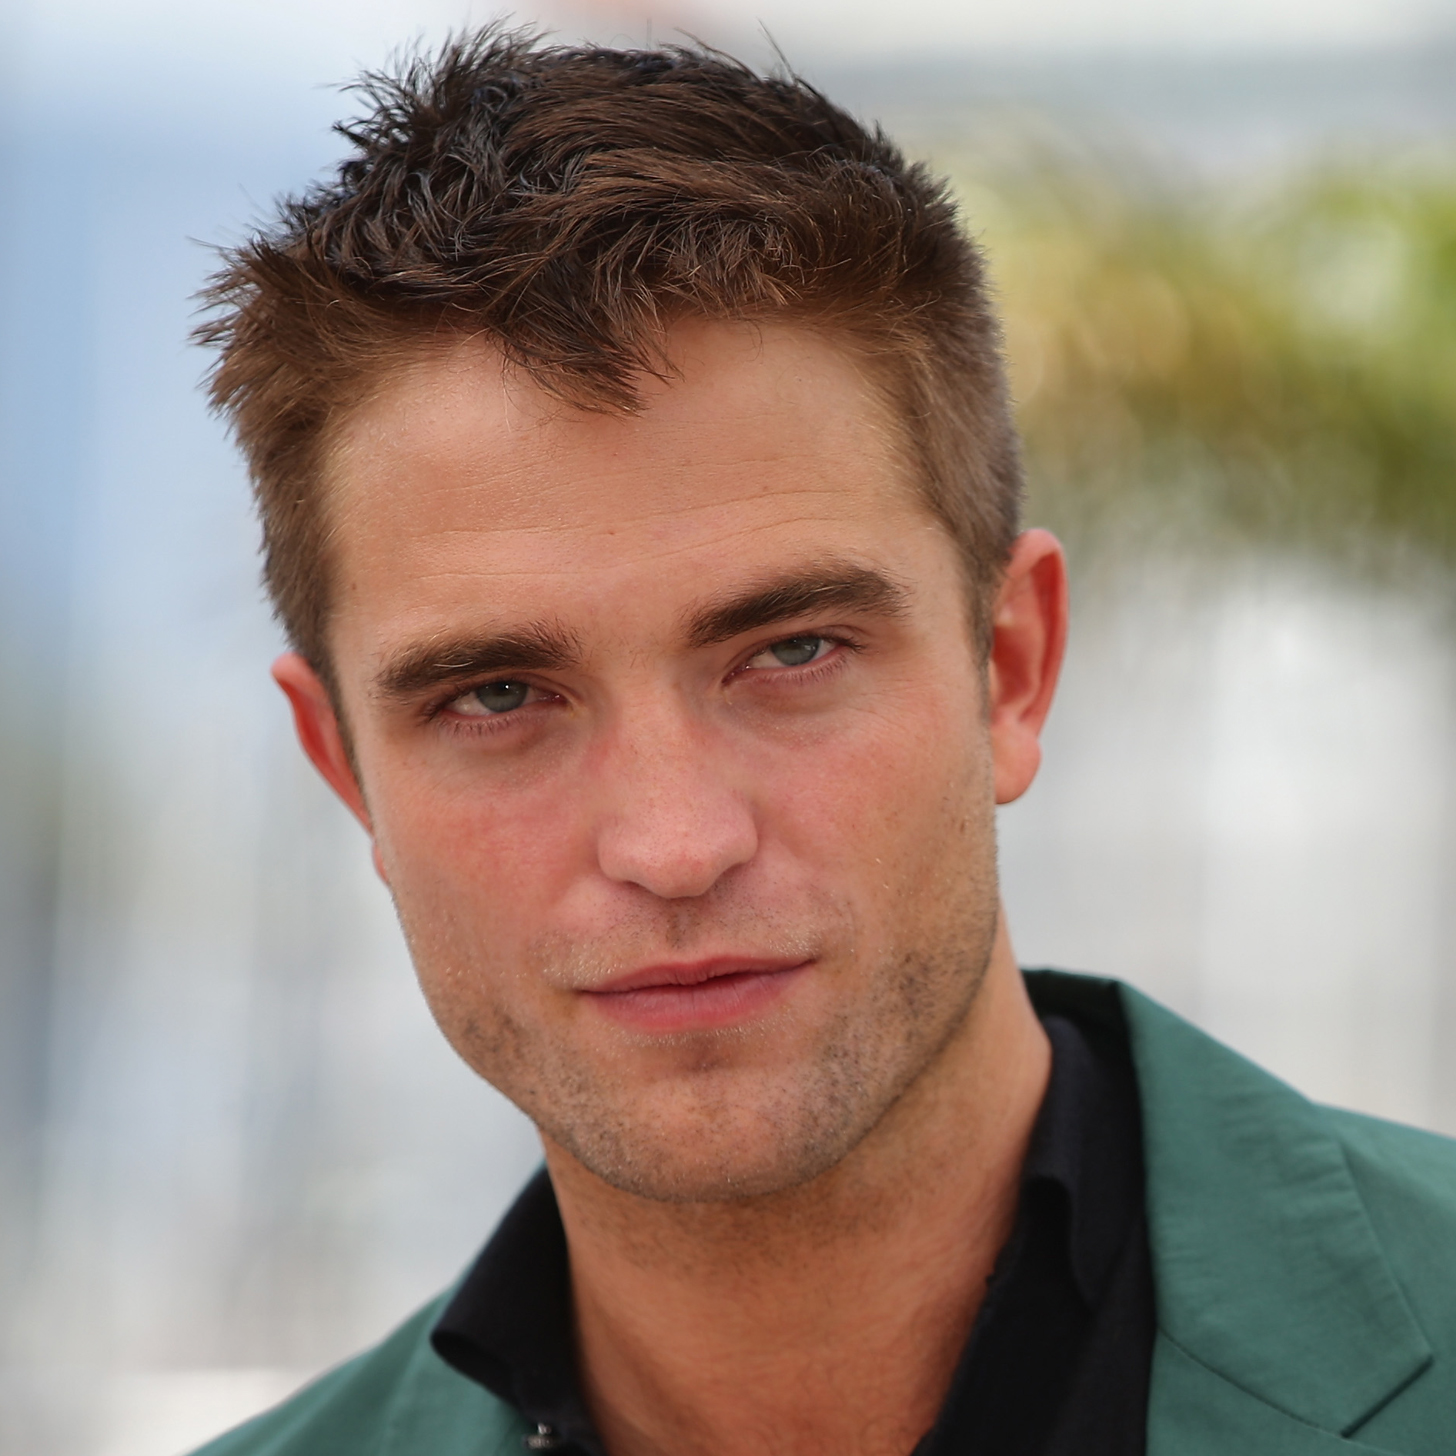 Robert Pattinson: Robert Pattinson At Cannes Film Festival 2014